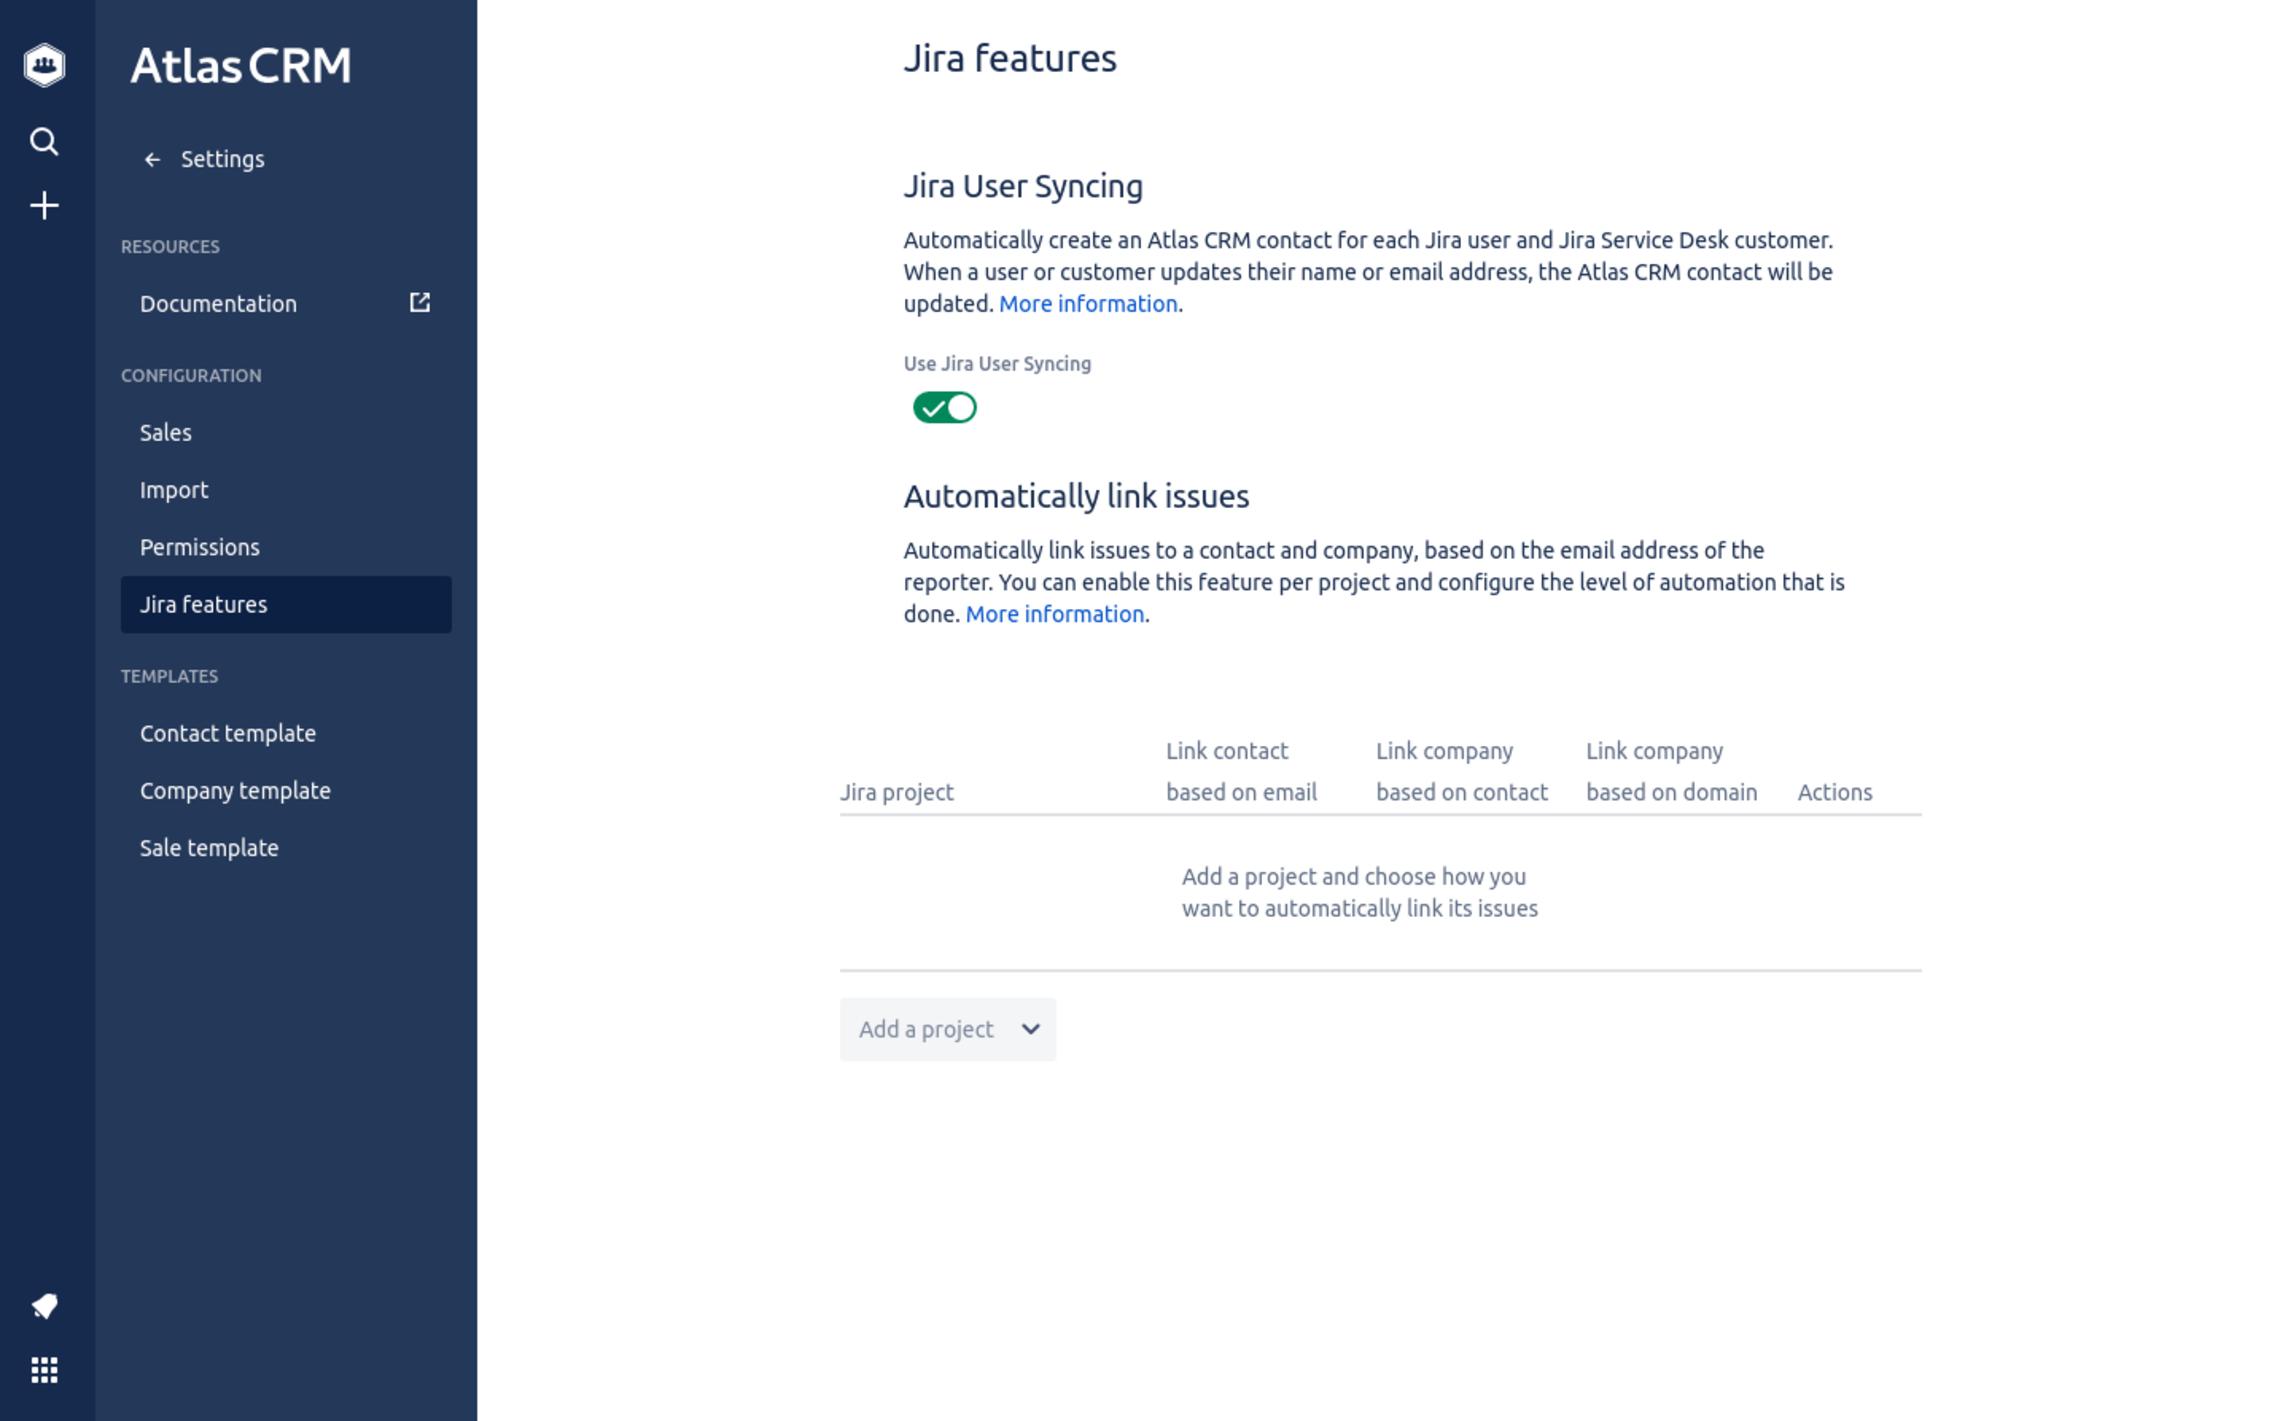 Jira user syncing in Atlas CRM